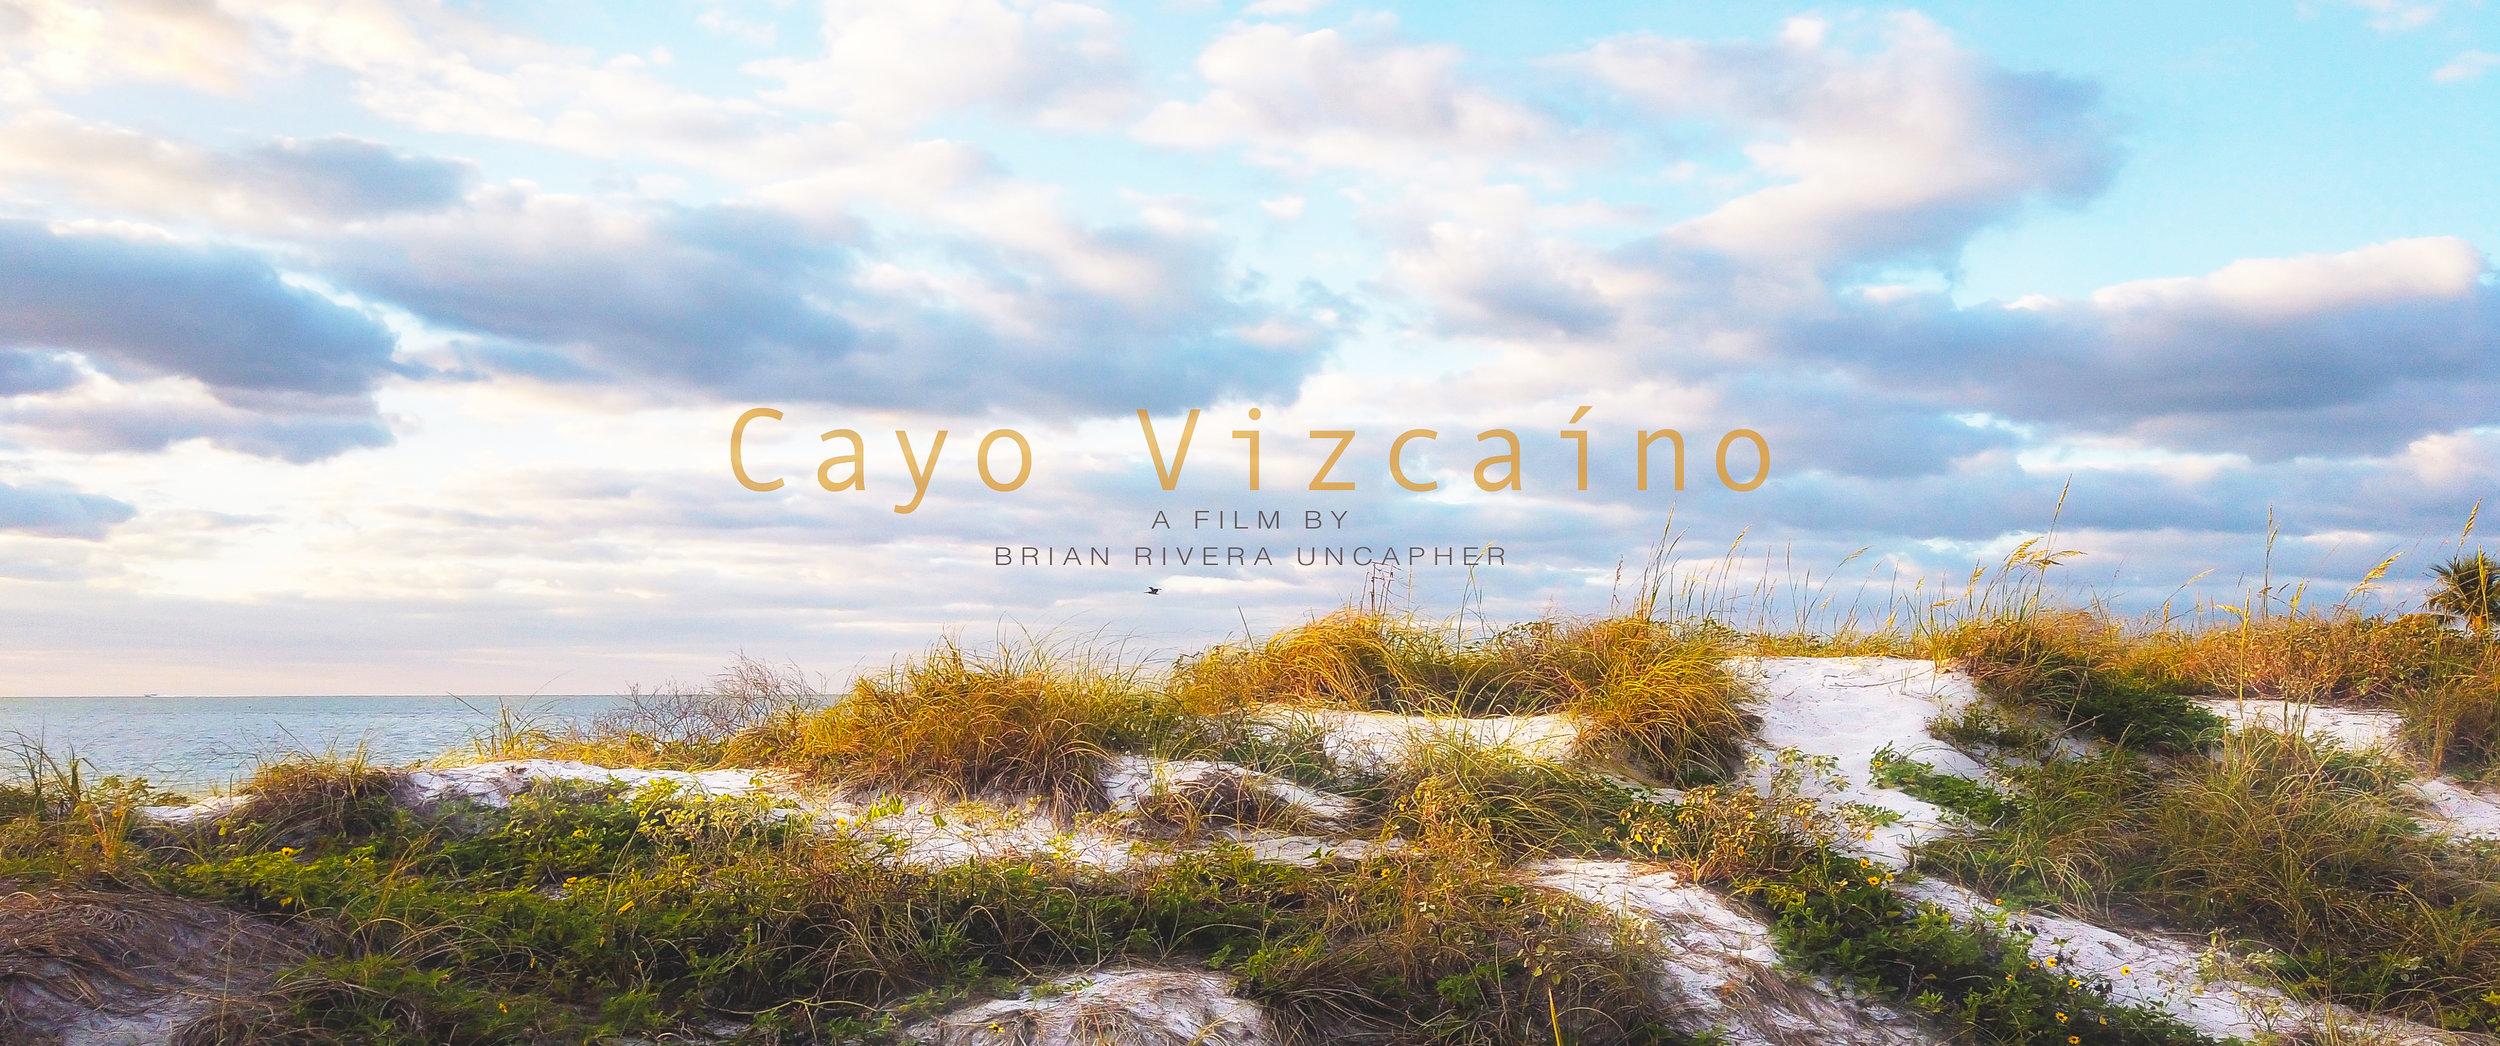 CayoVizcaino_Thumbnail©BrianRiveraUncapher.jpg